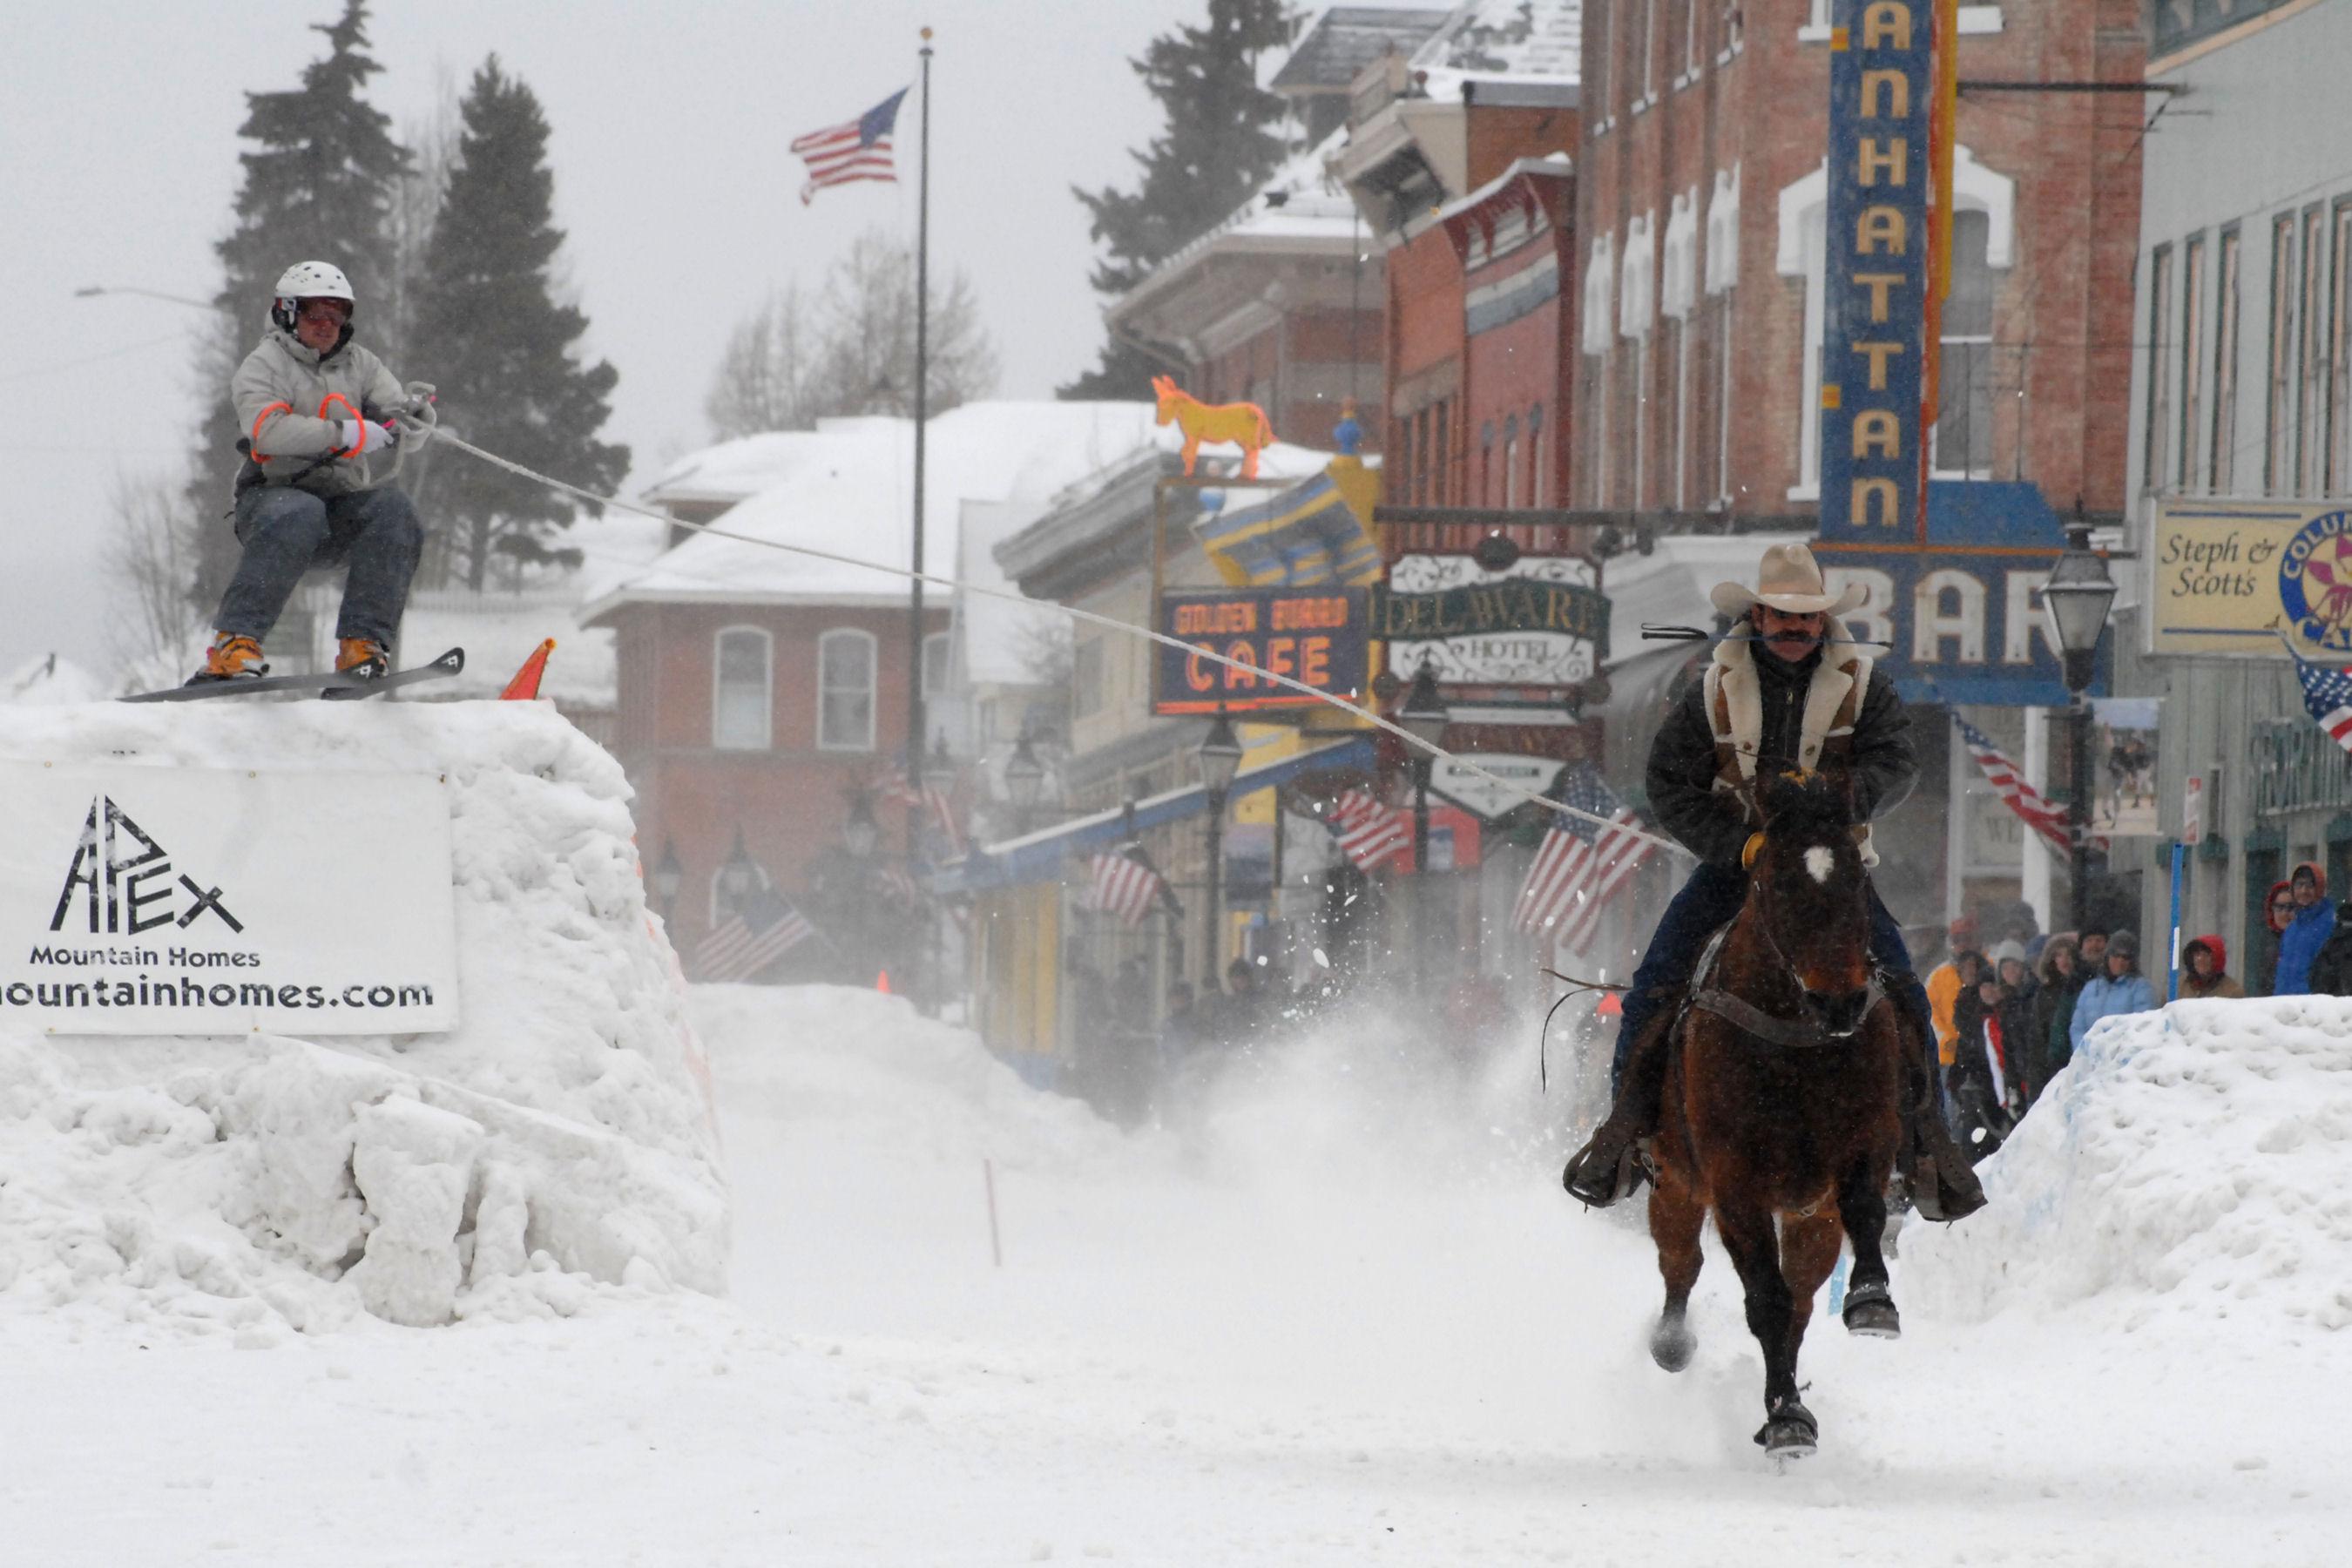 Leadville Colorado Celebrates Winter With Ski Joring And